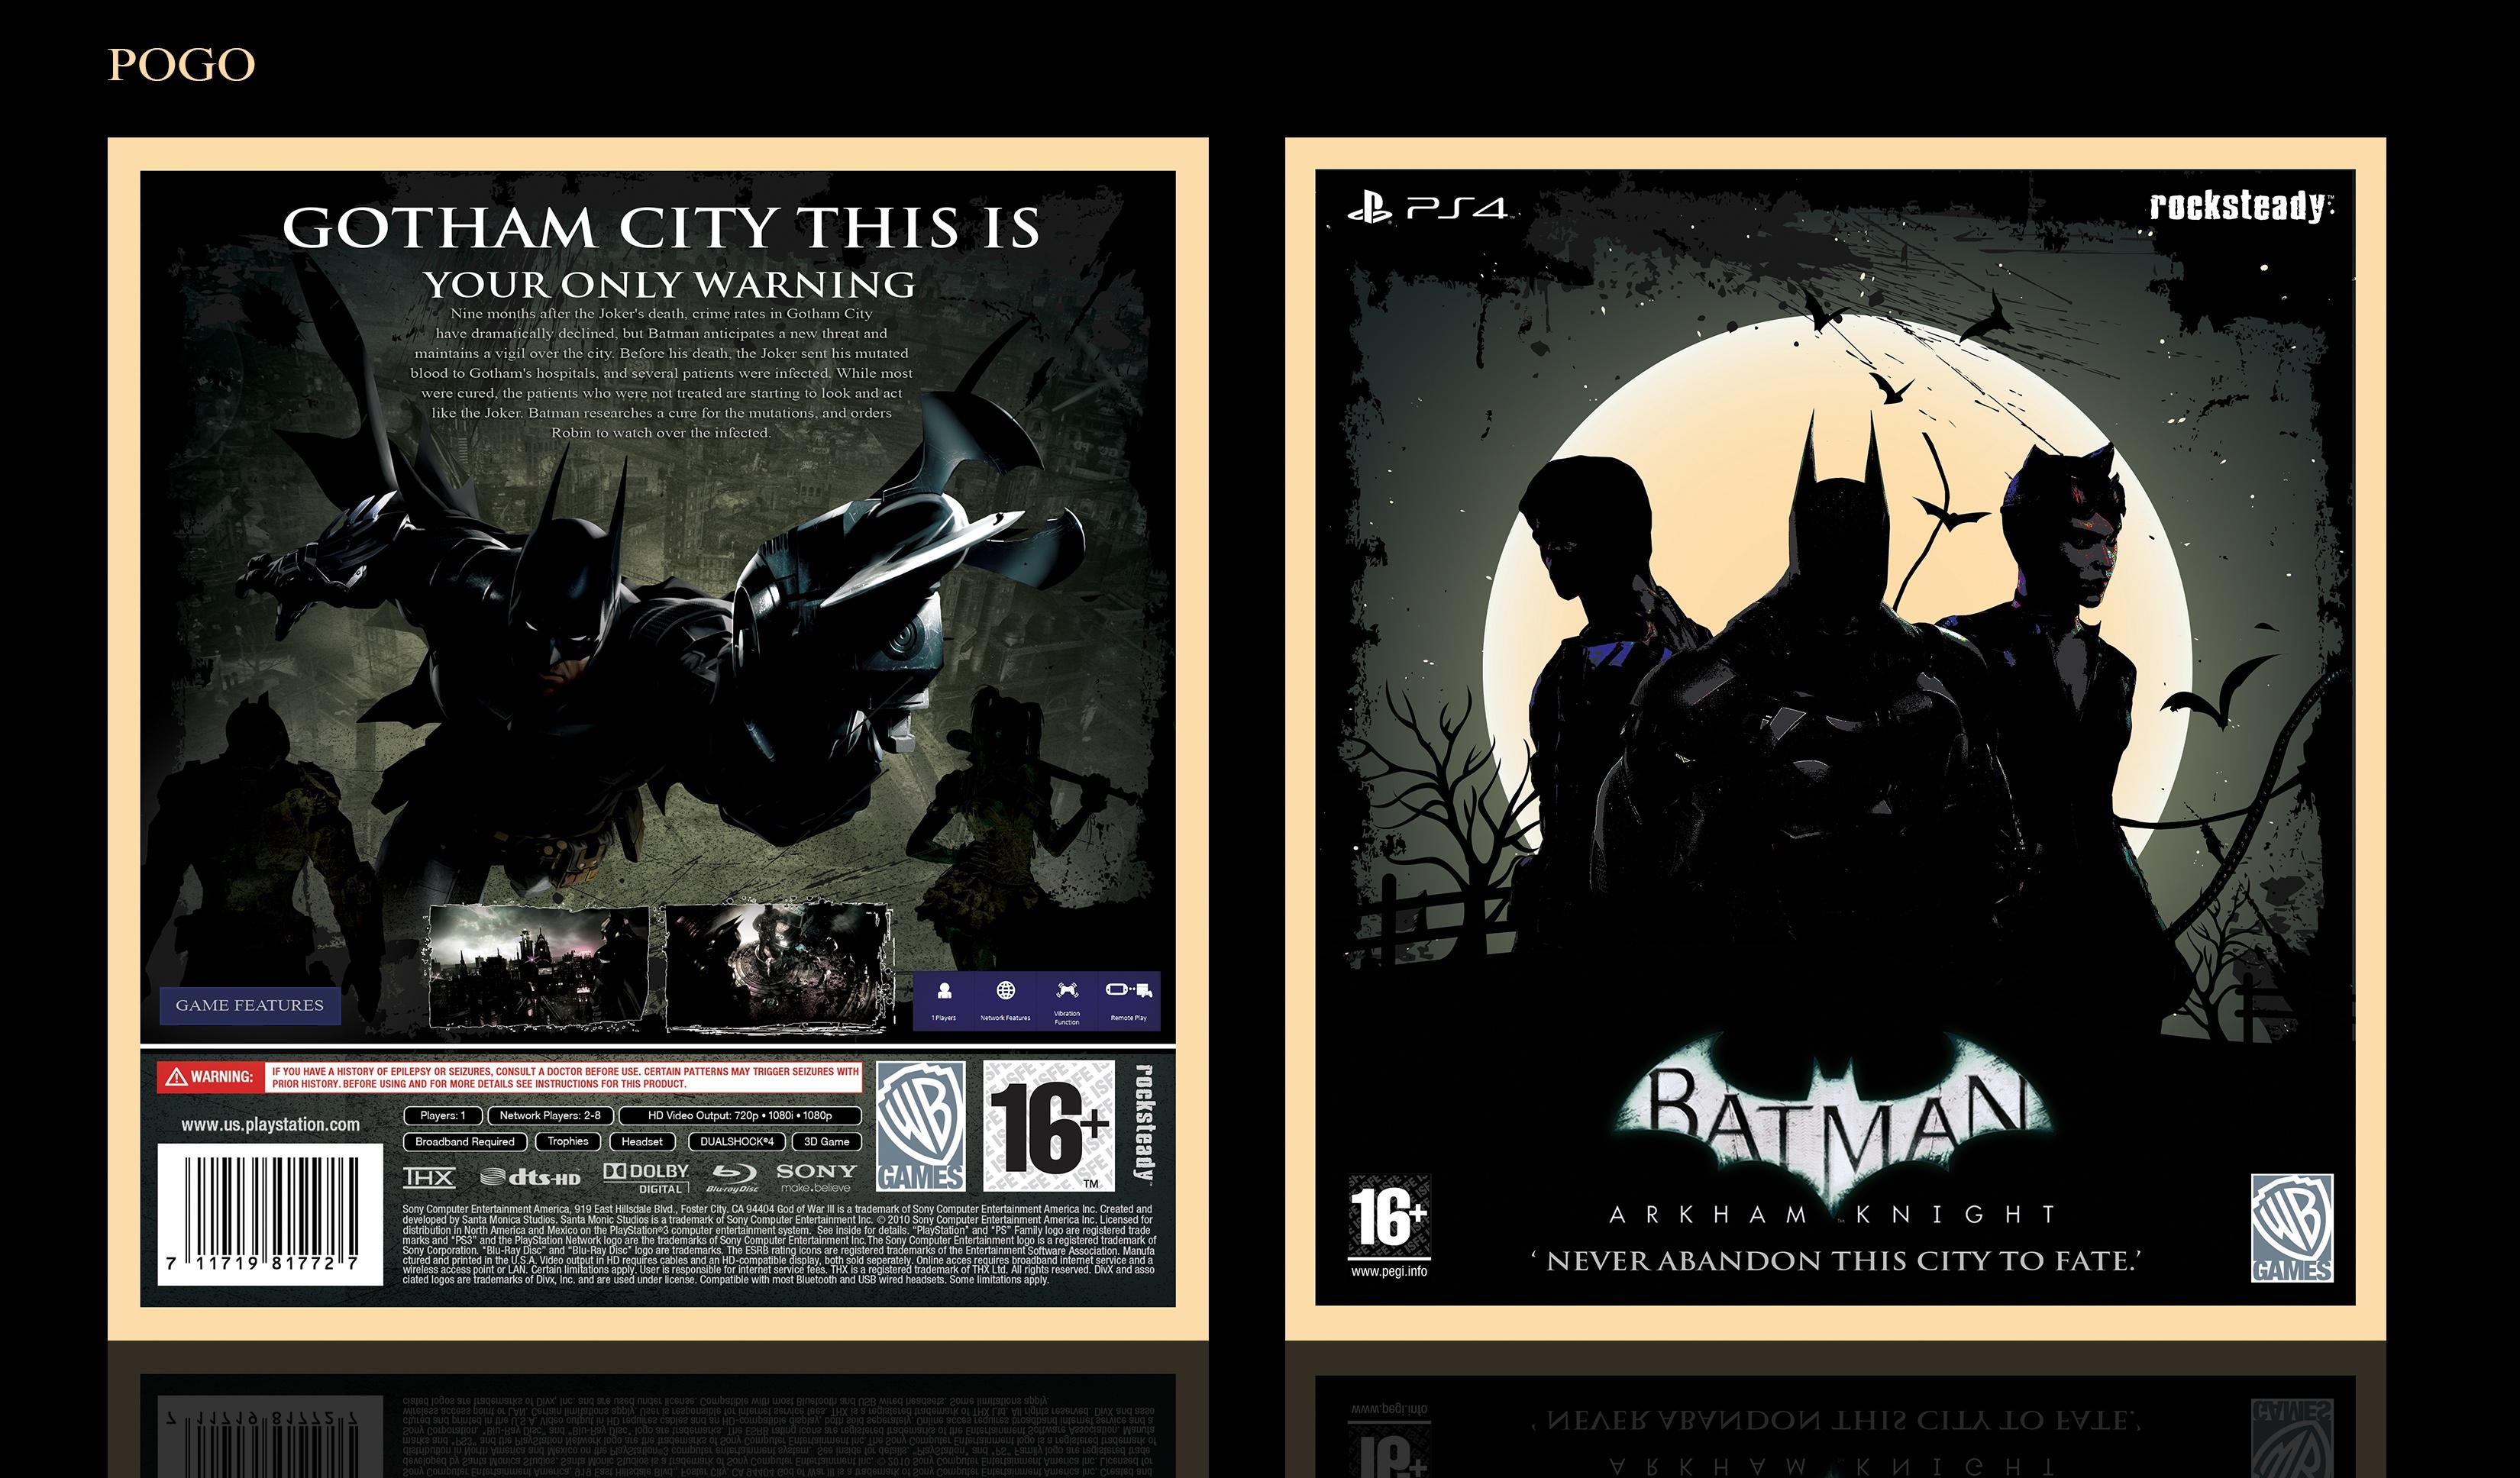 Batman: Arkham Knight PlayStation 4 Box Art Cover by pogo